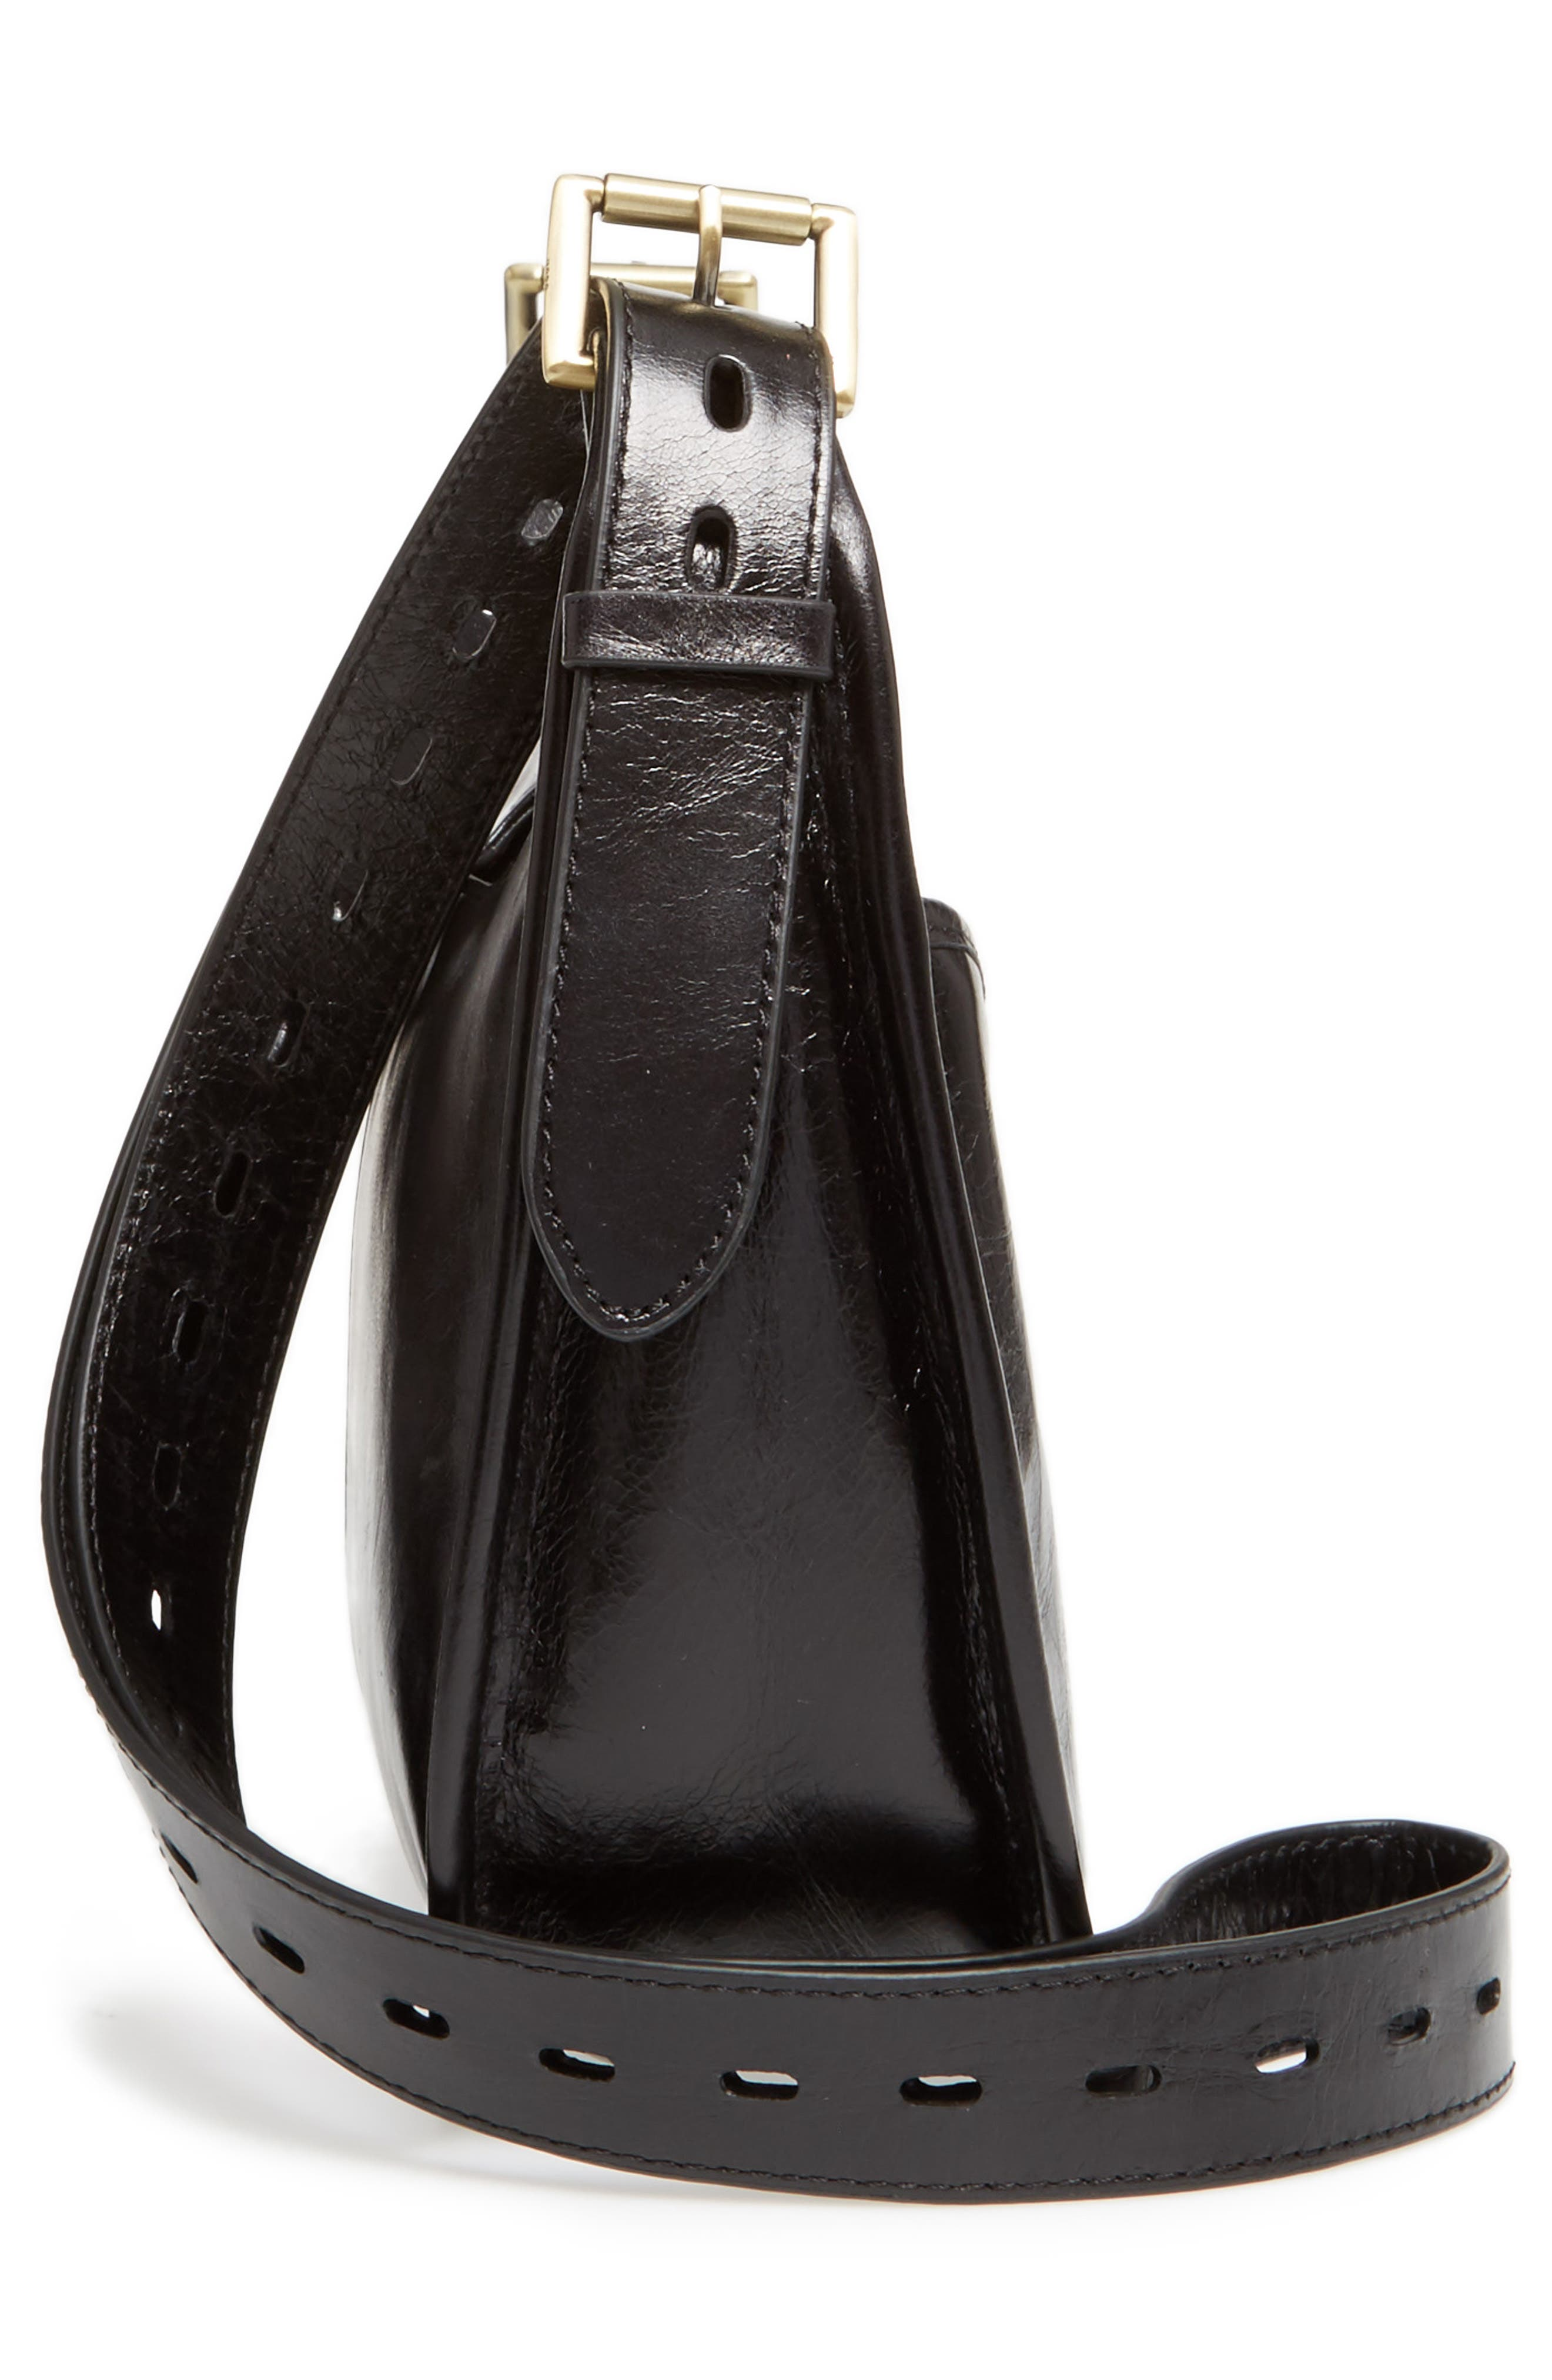 Chase Calfskin Leather Crossbody Bag,                             Alternate thumbnail 4, color,                             Black